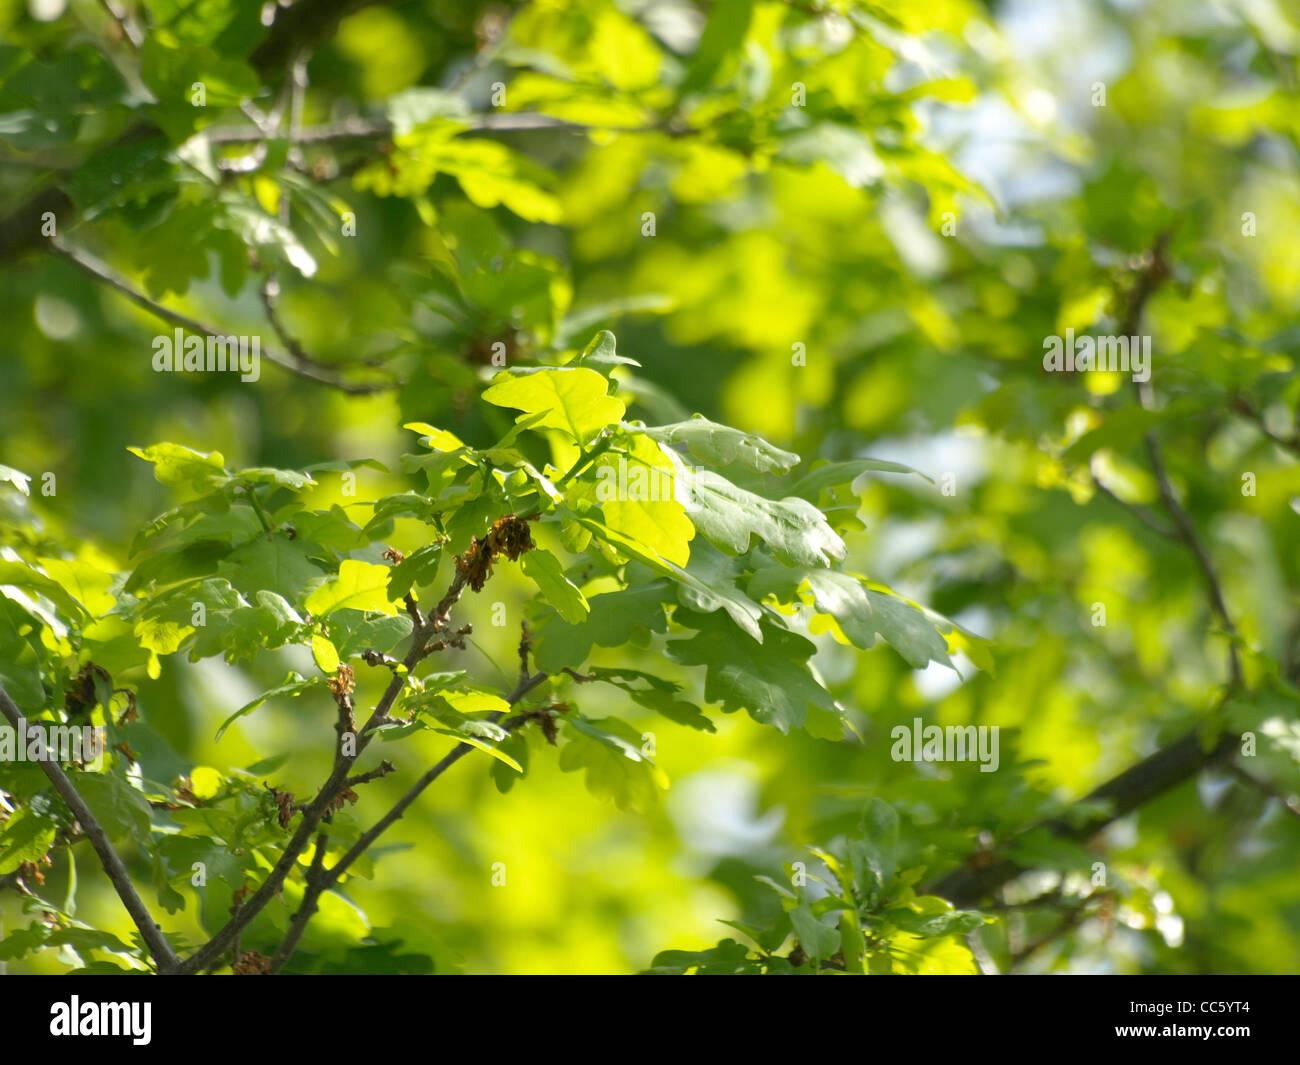 English Oak, tree / Quercus robur  / Stiel-Eiche - Stock Image